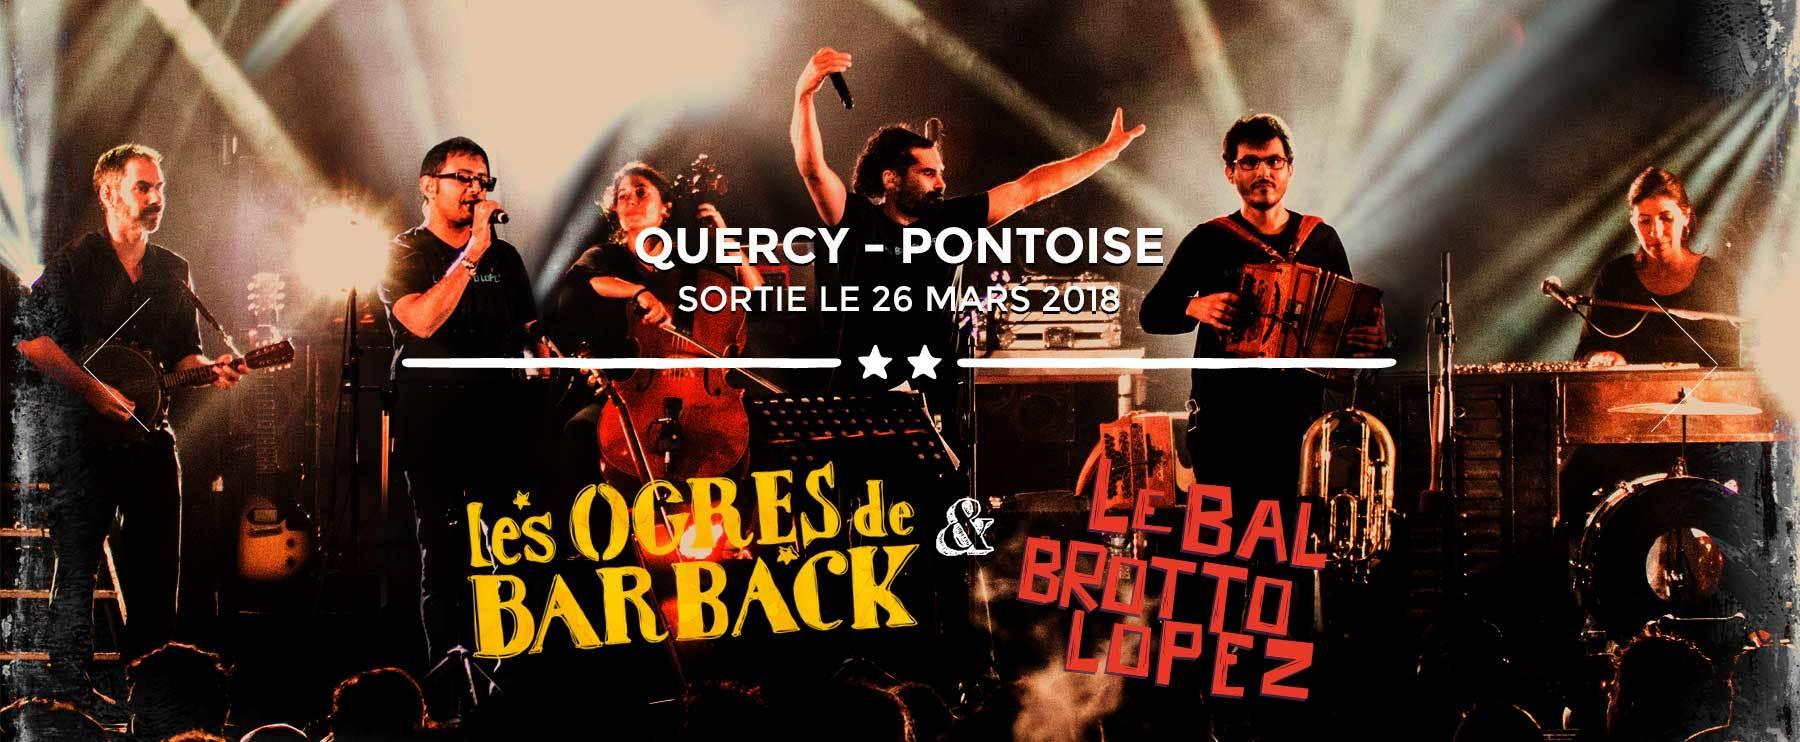 Les Ogres de Barback & Le Bal Brotto Lopez